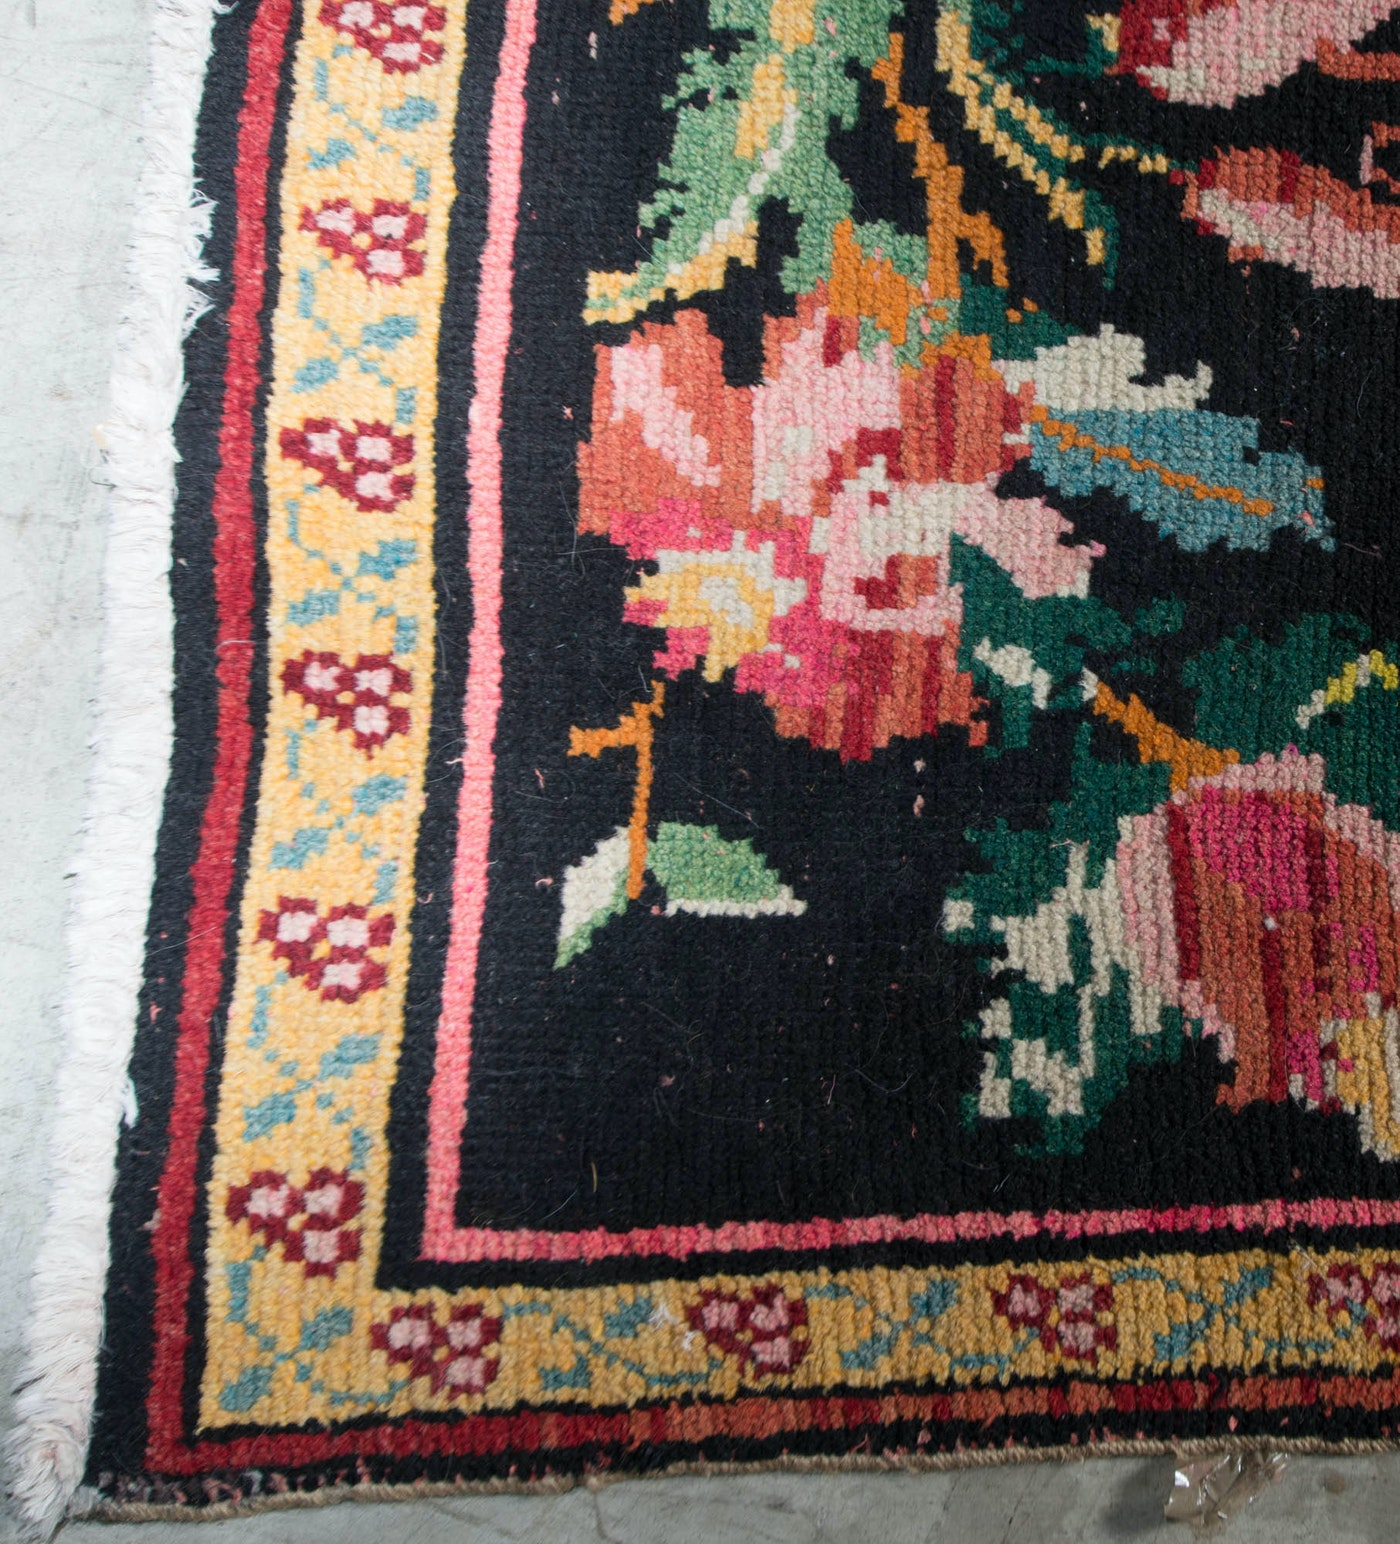 Persian Hand Woven Bakhtiari Style Wool Area Rug Ebth: Handwoven Romanian Bessarabian Style Area Rug : EBTH